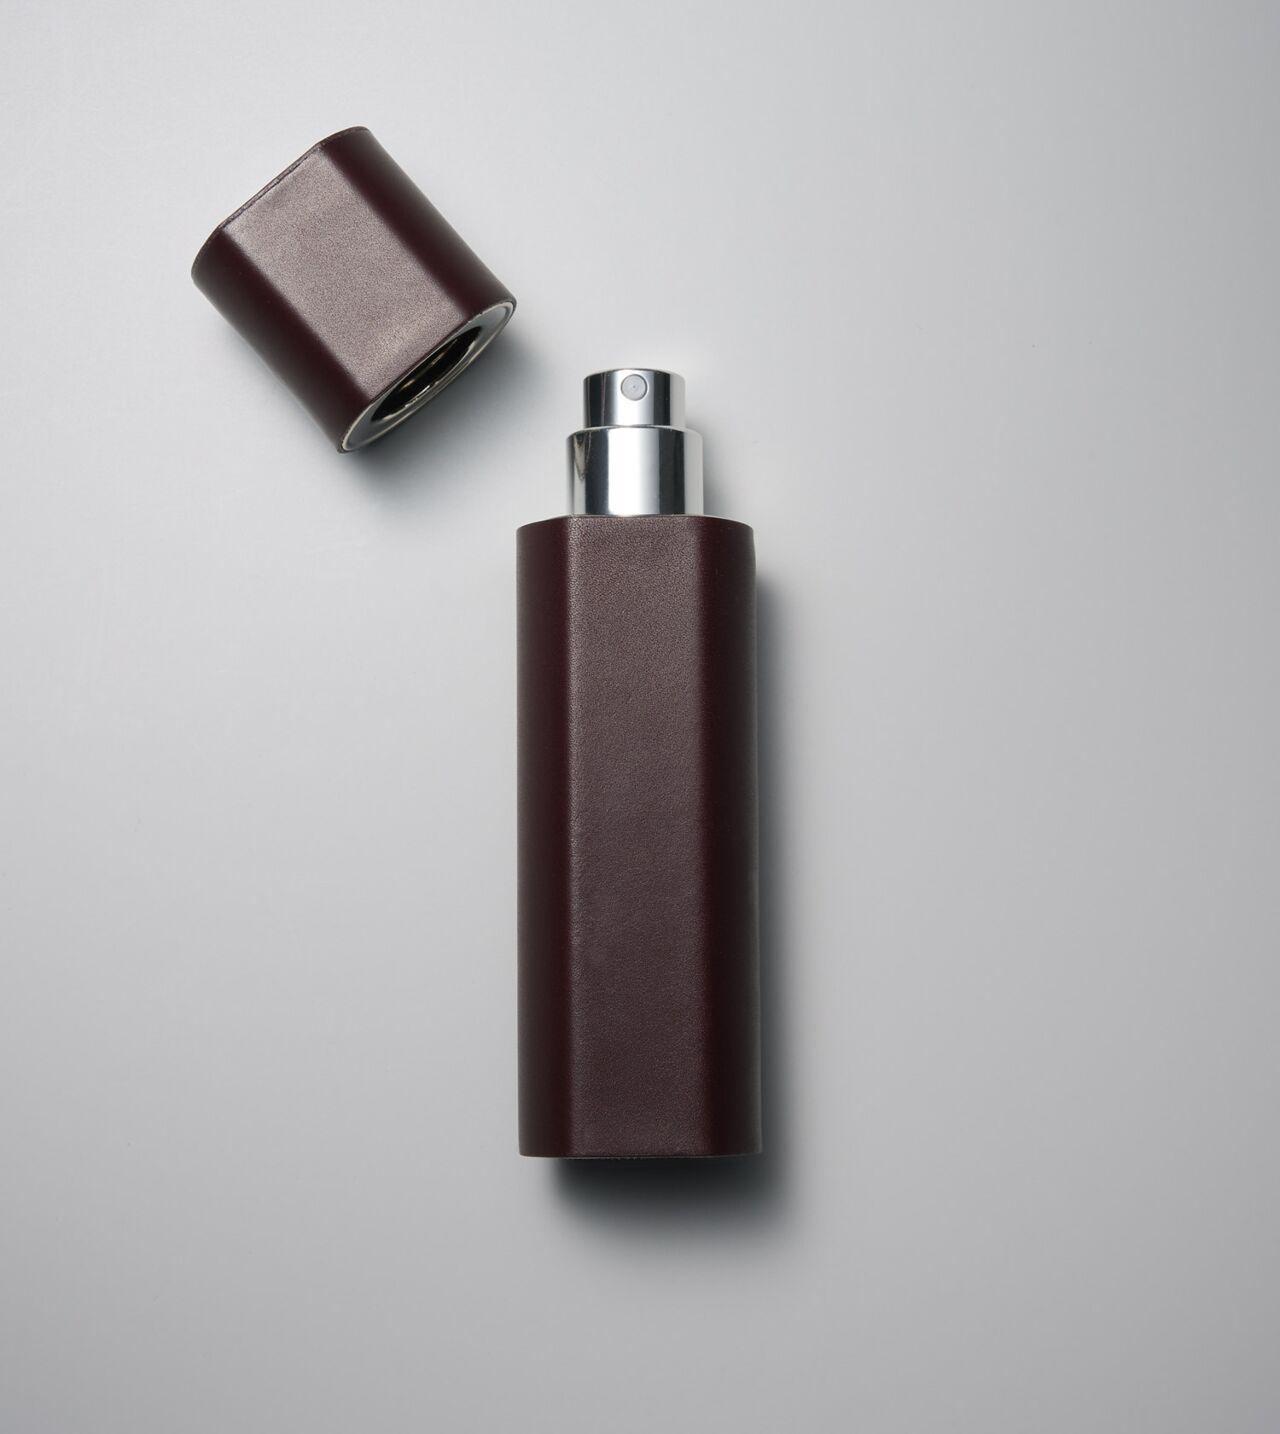 Picture of Byredo Travel perfume case Burgundy